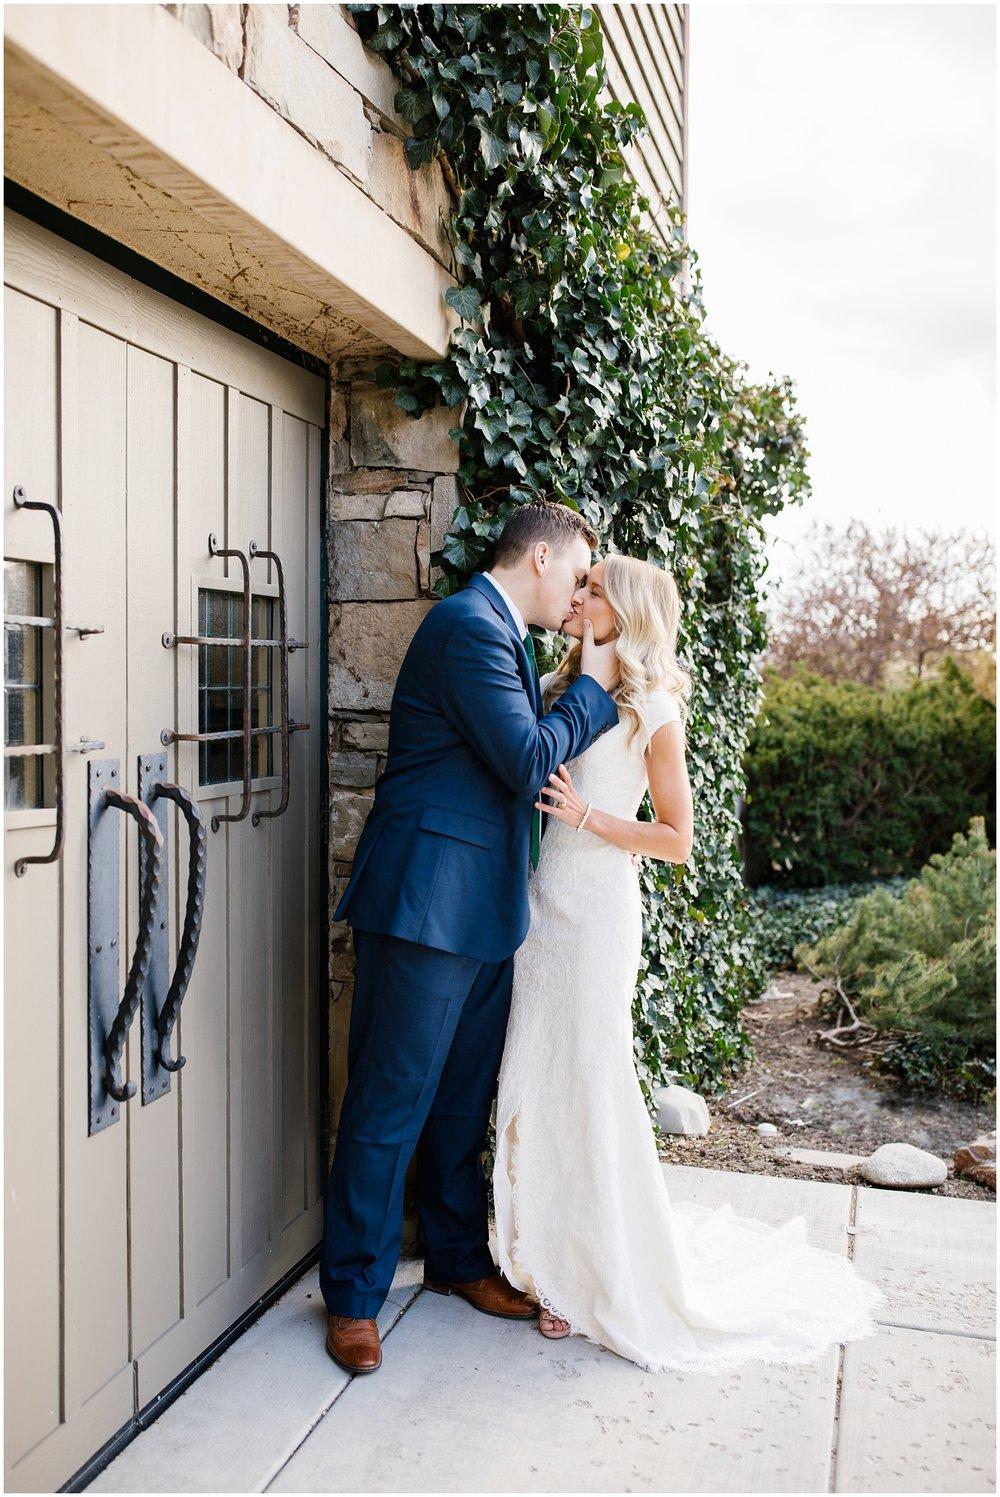 TA-Bridals-1_Lizzie-B-Imagery-Utah-Wedding-Photographer-Park-City-Salt-Lake-City-Thanksgiving-Point-Ashton-Gardens-Lehi-Utah.jpg